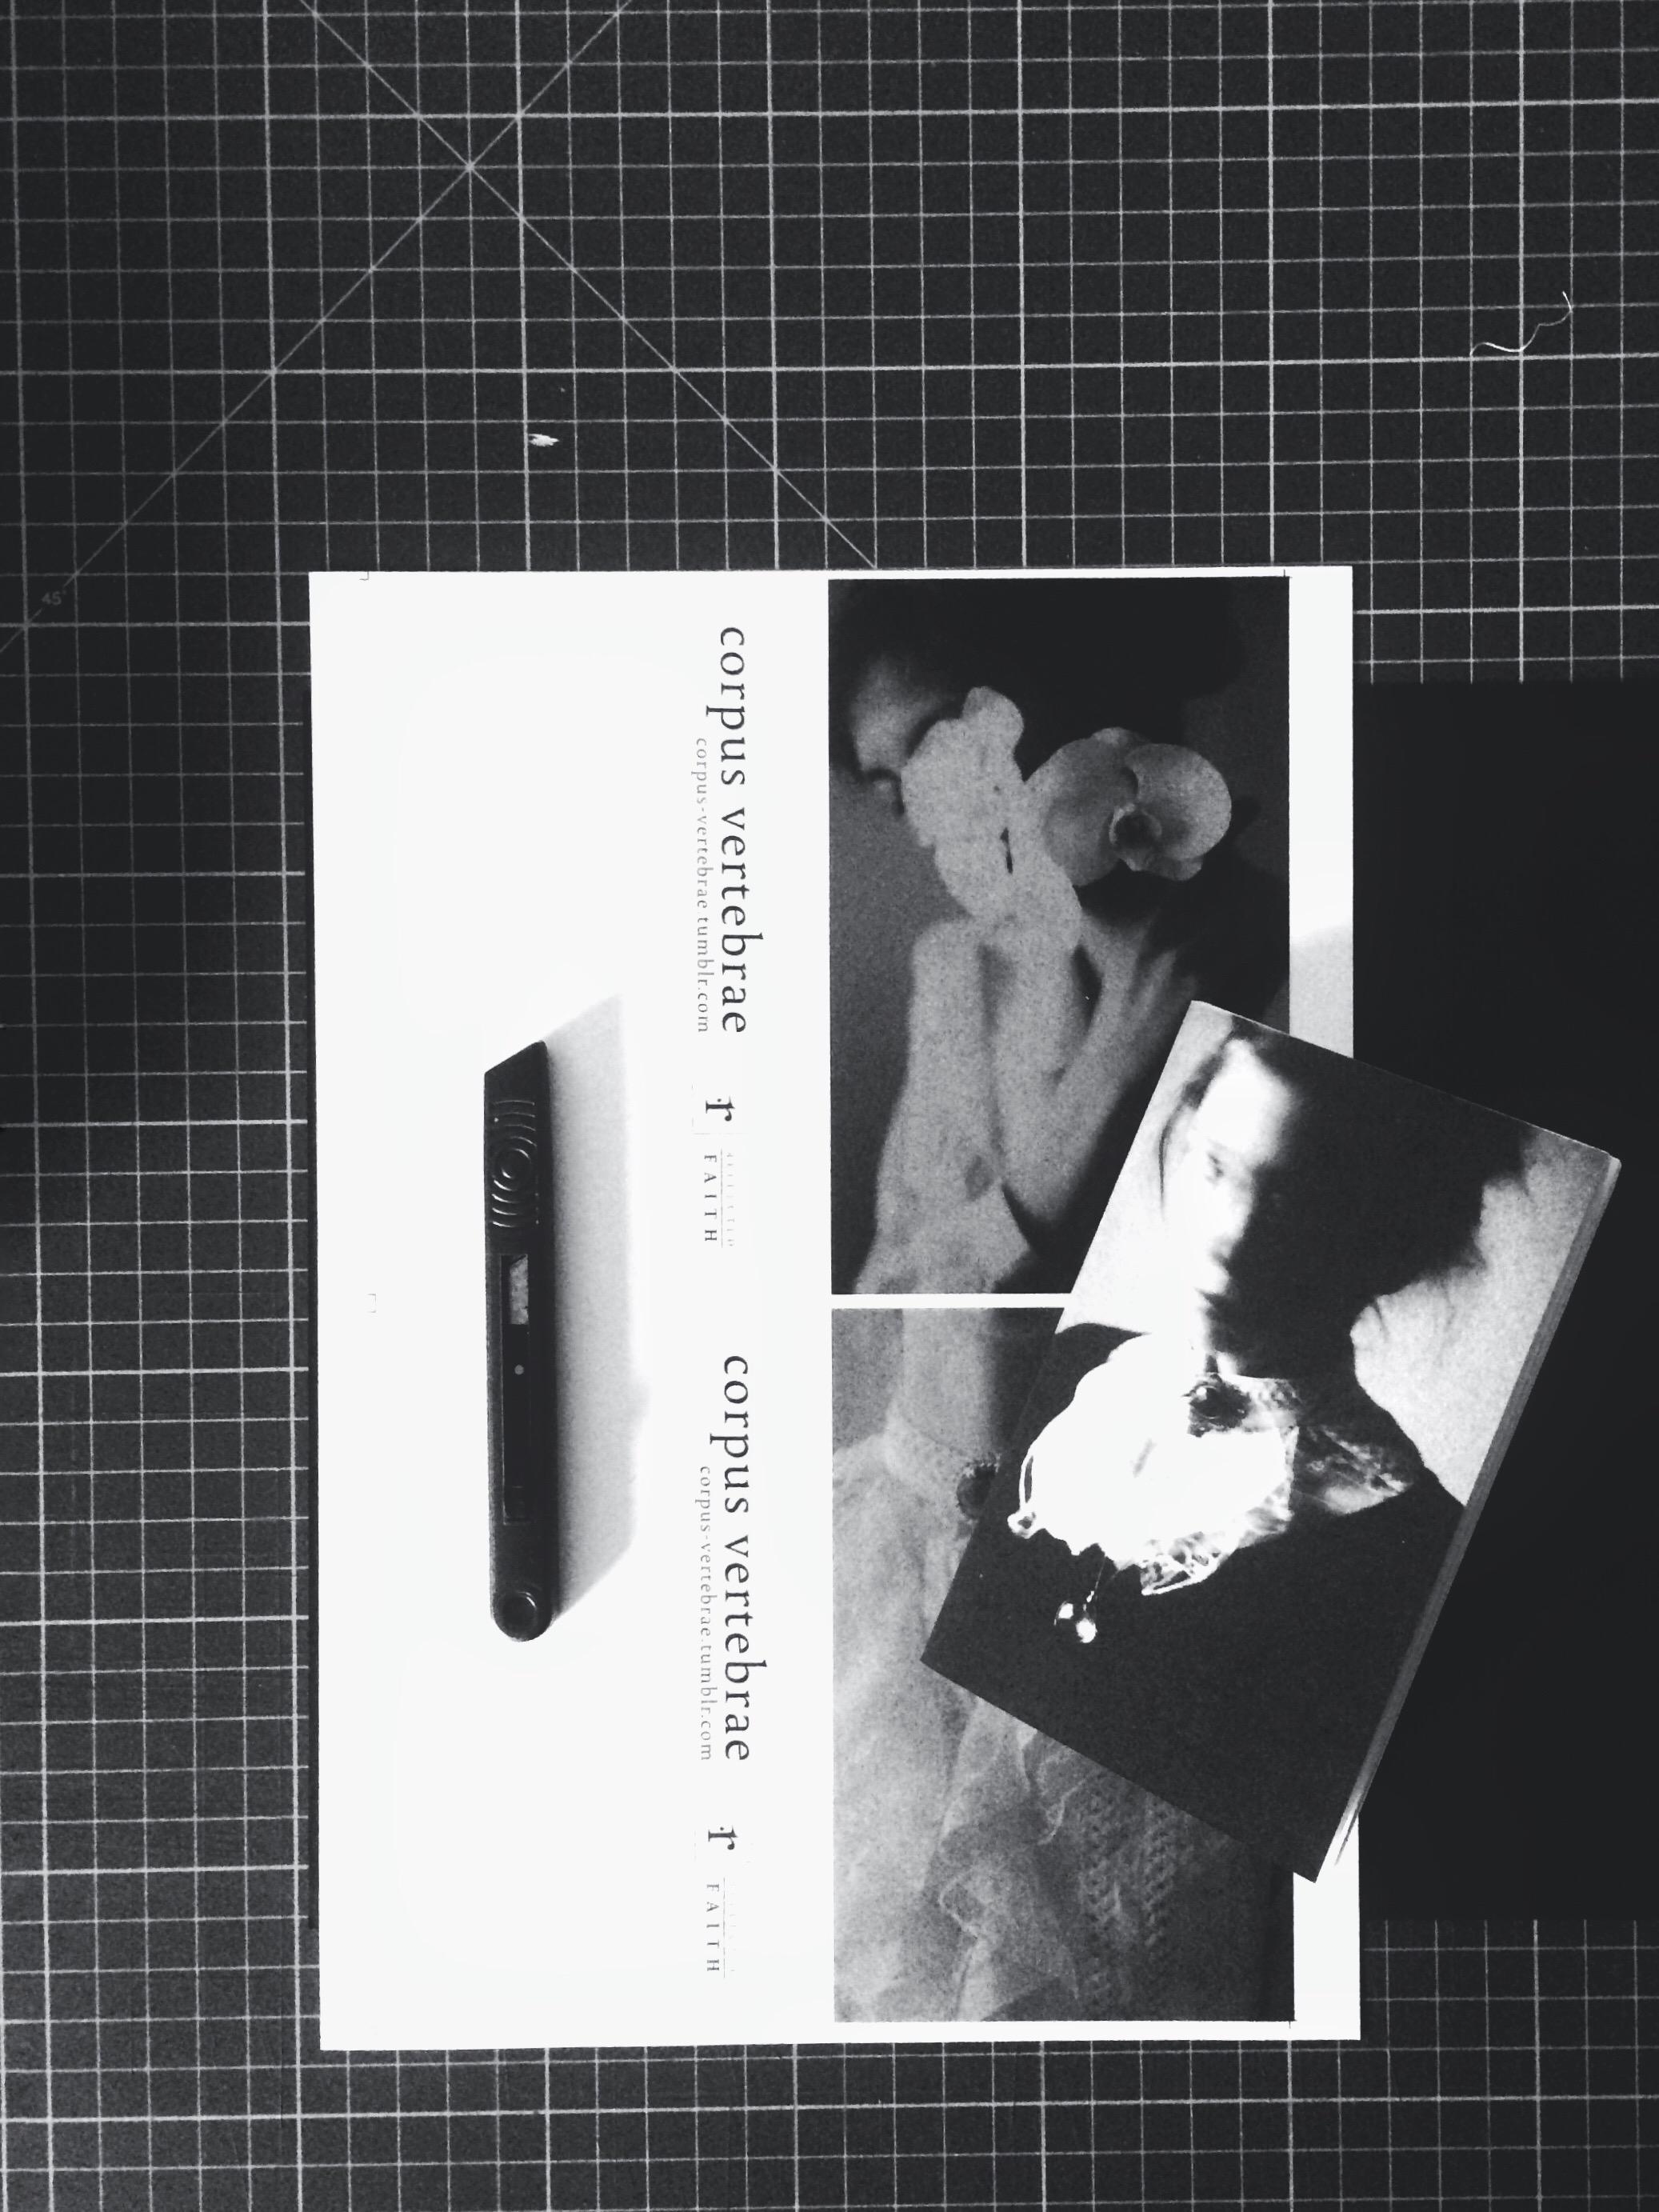 corpus vertebrae, michalina woźniak, notebooks, photography, dark, obscure